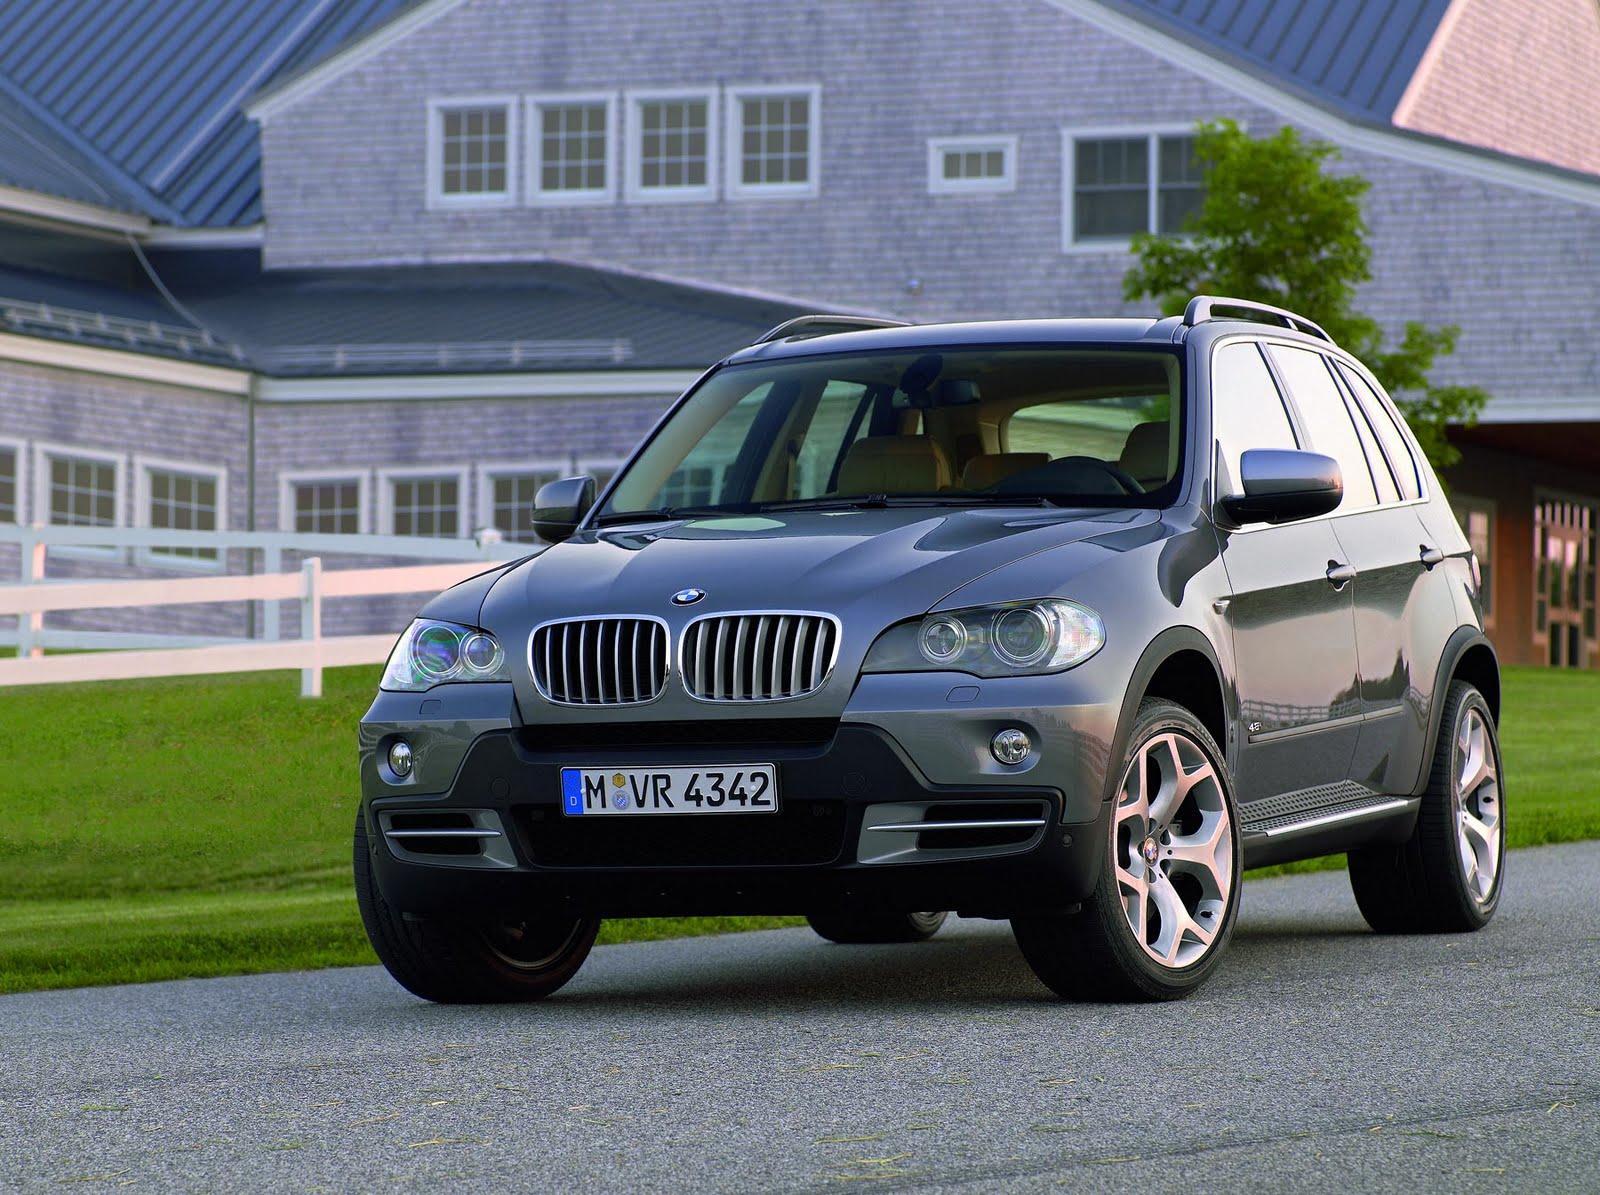 SPORTS CARS: BMW X5 wallpaper hd widescreen